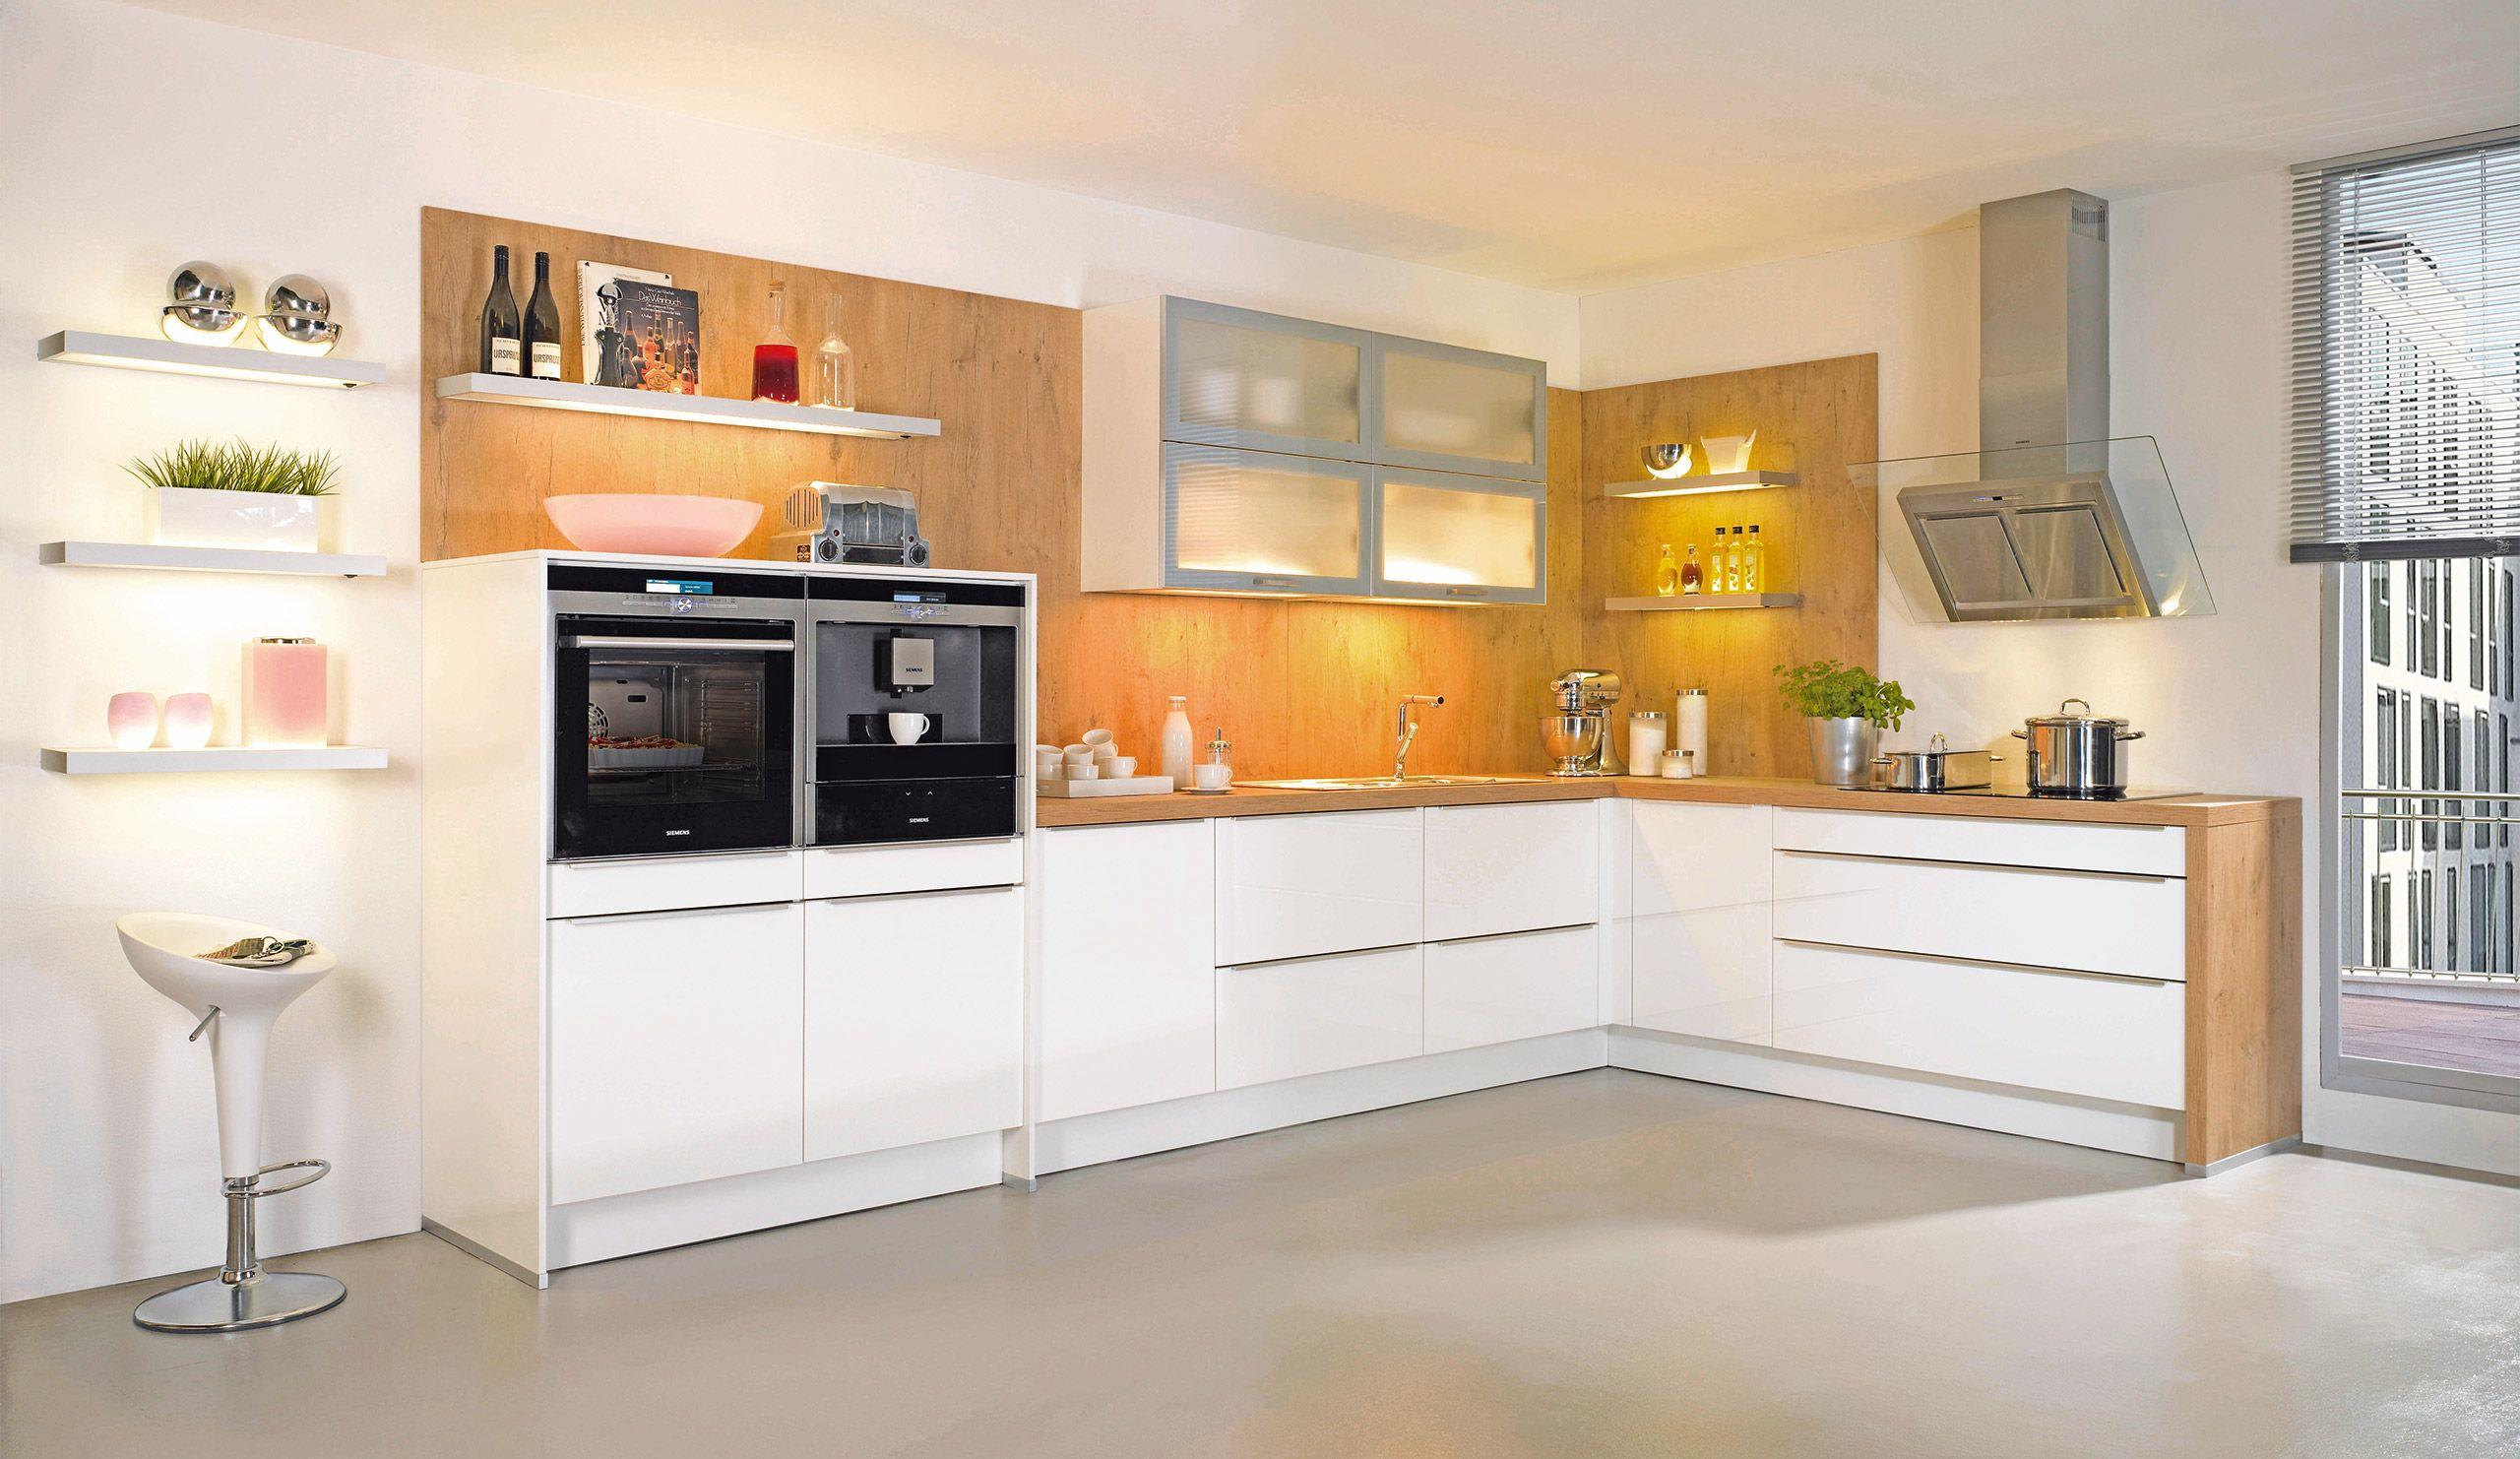 Eckschrank Küche Arbeitsplatte – Home Sweet Home